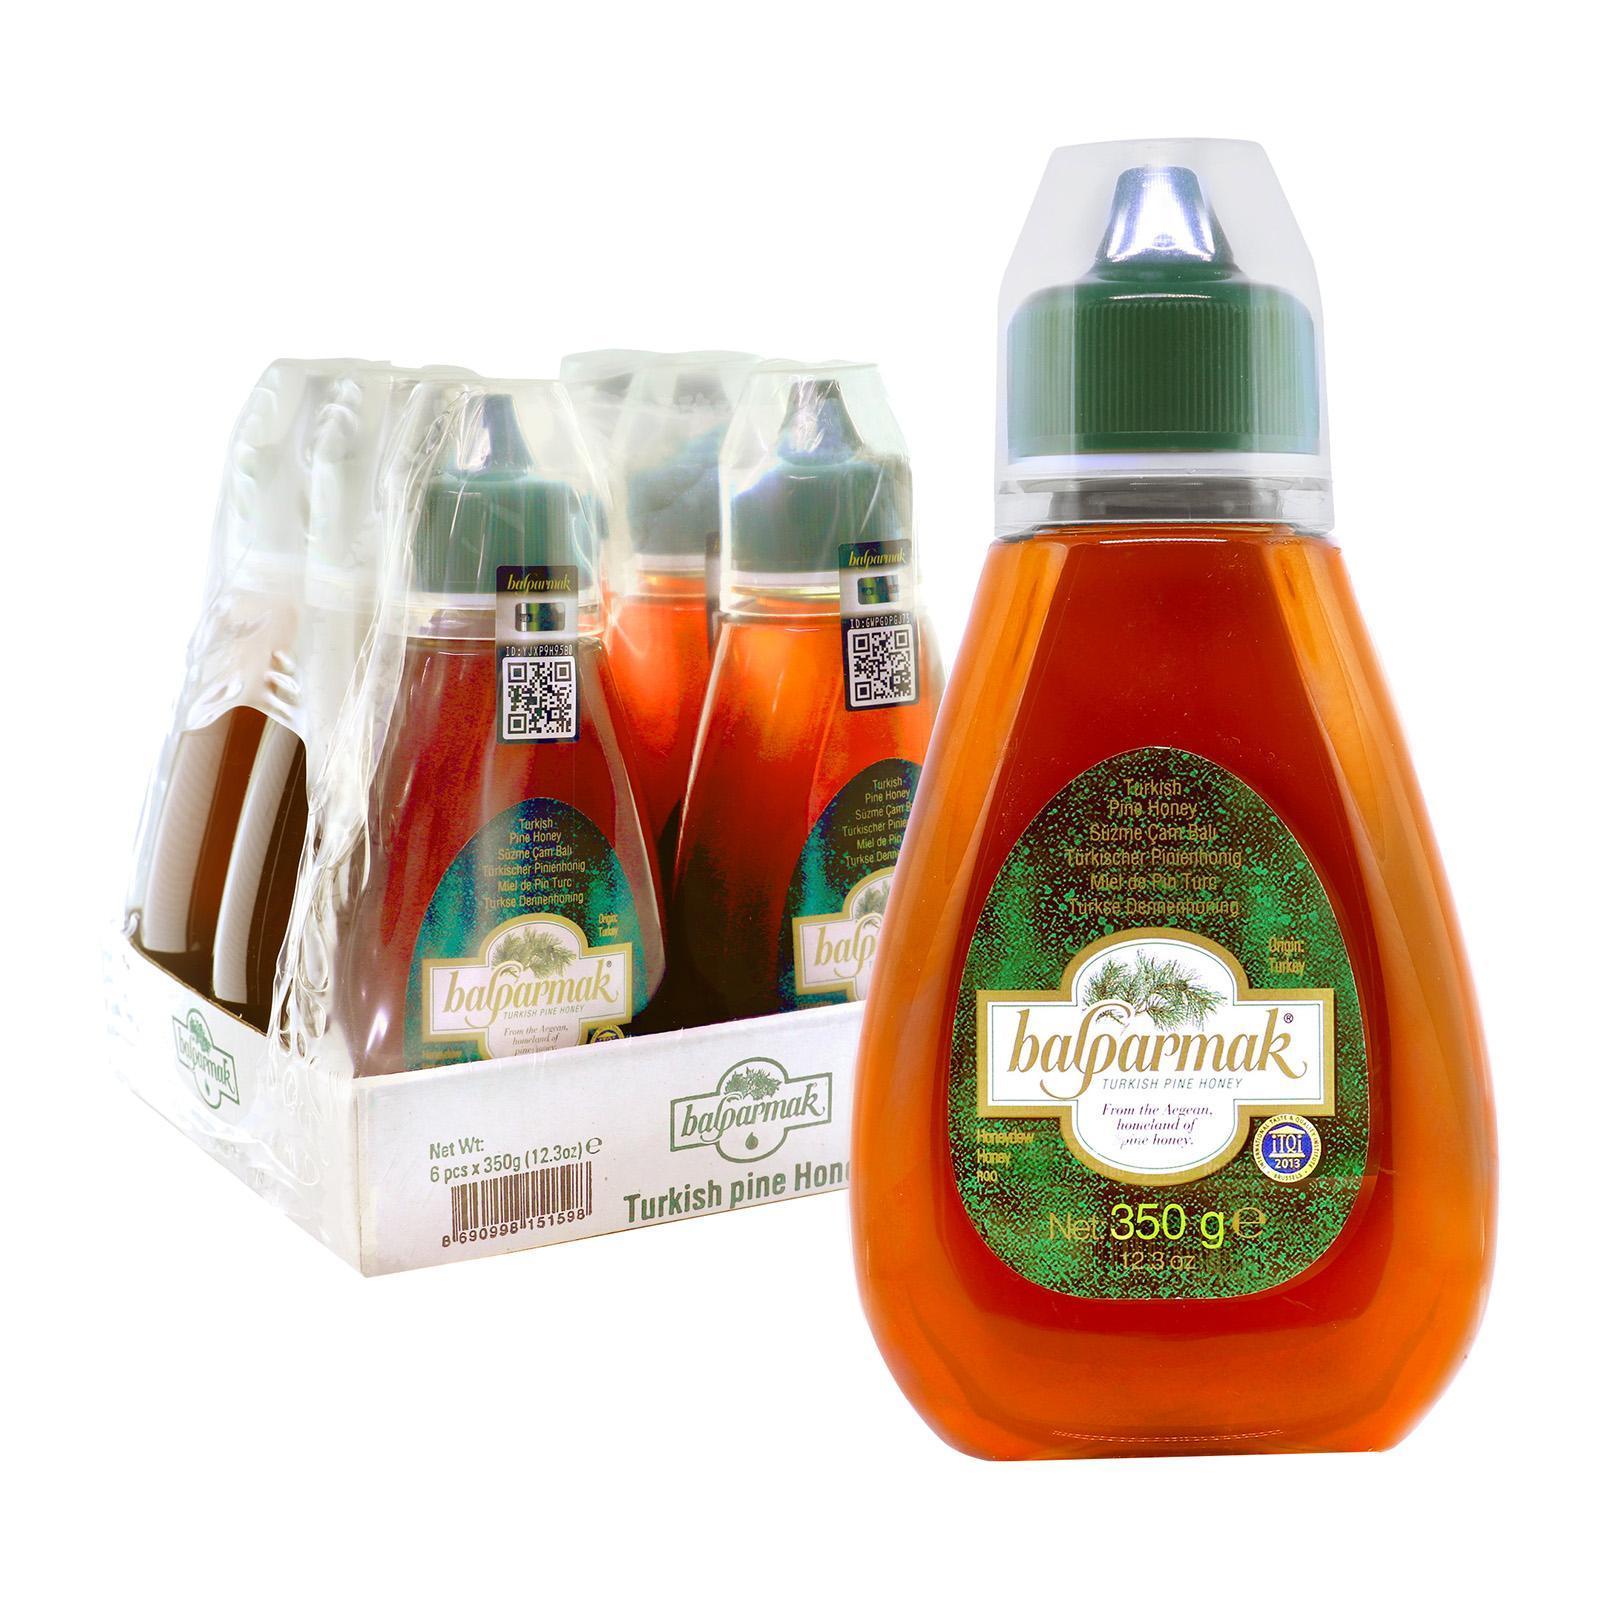 Balparmak Pine Honey - Case